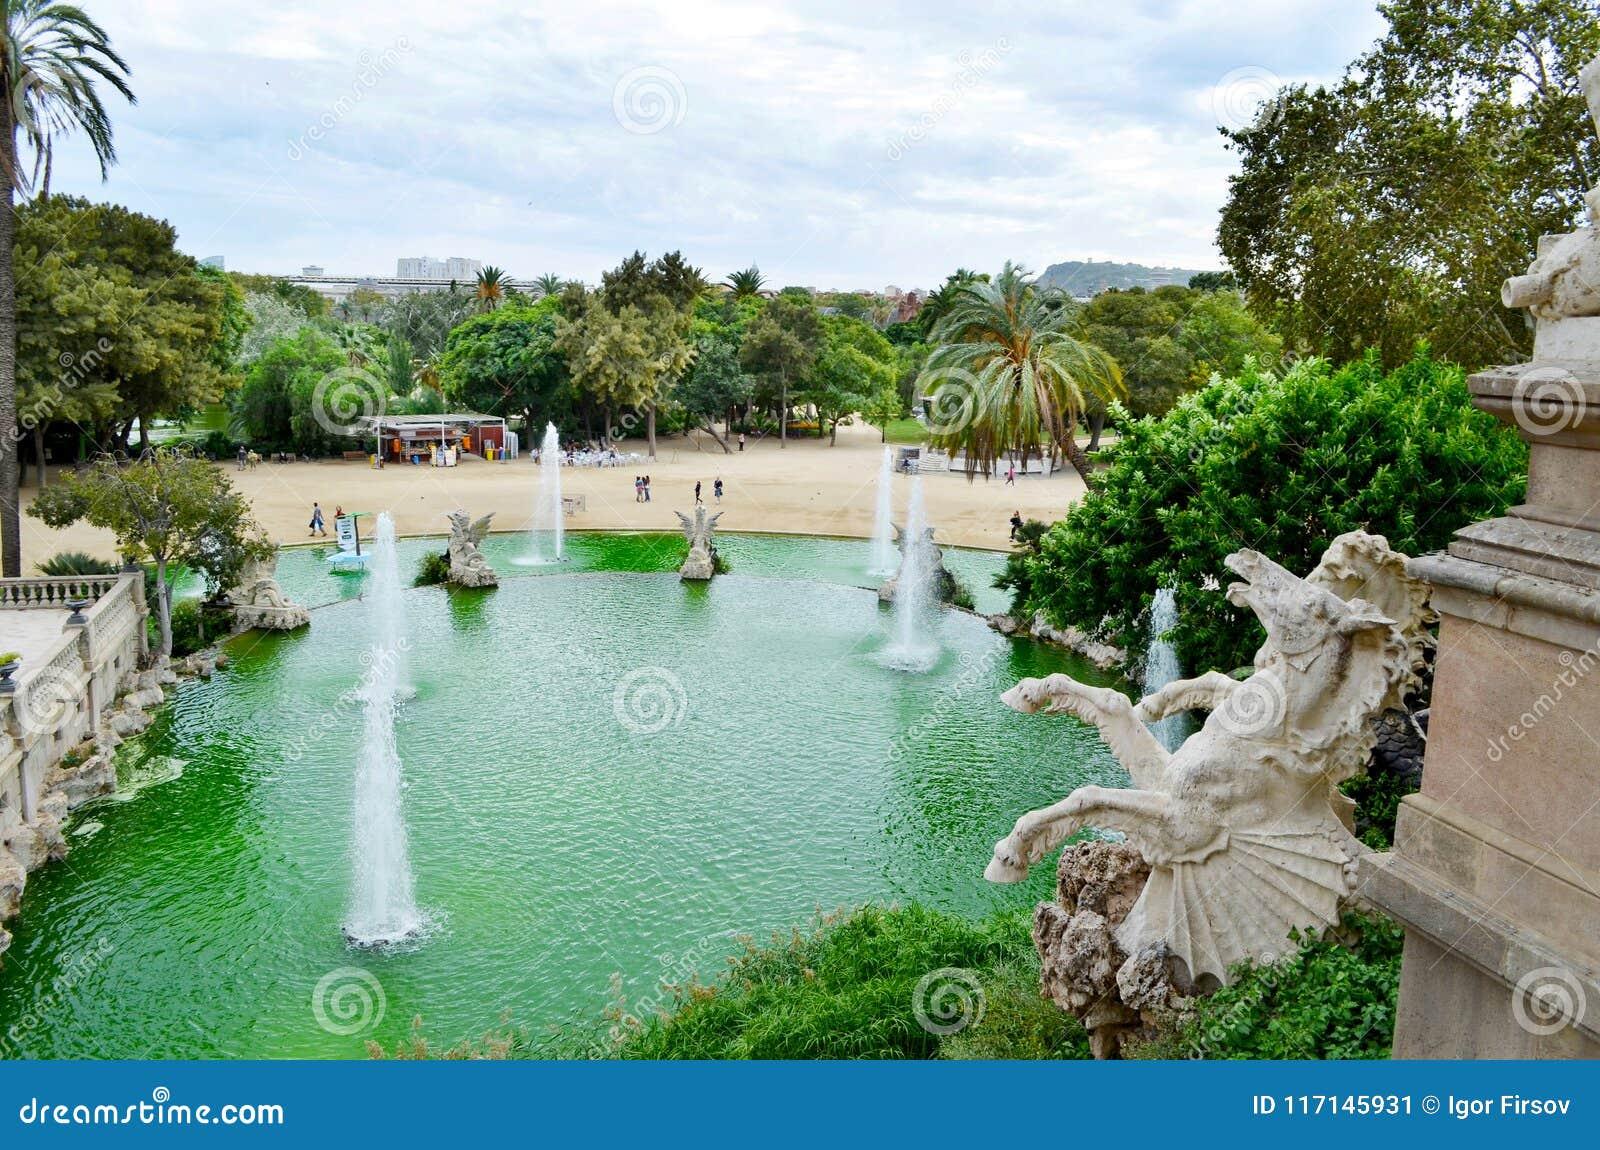 View of Barcelona, Spain. Fountain at Parc Citadel park de la Ciutadella